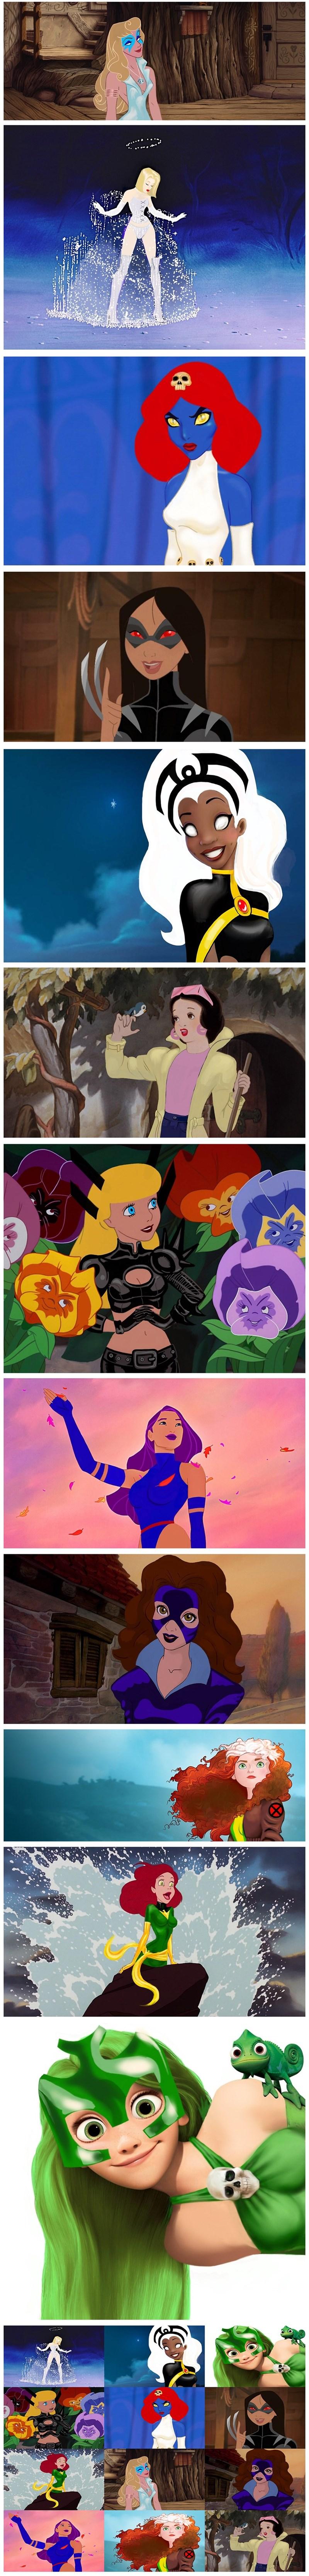 princesas disney xmen